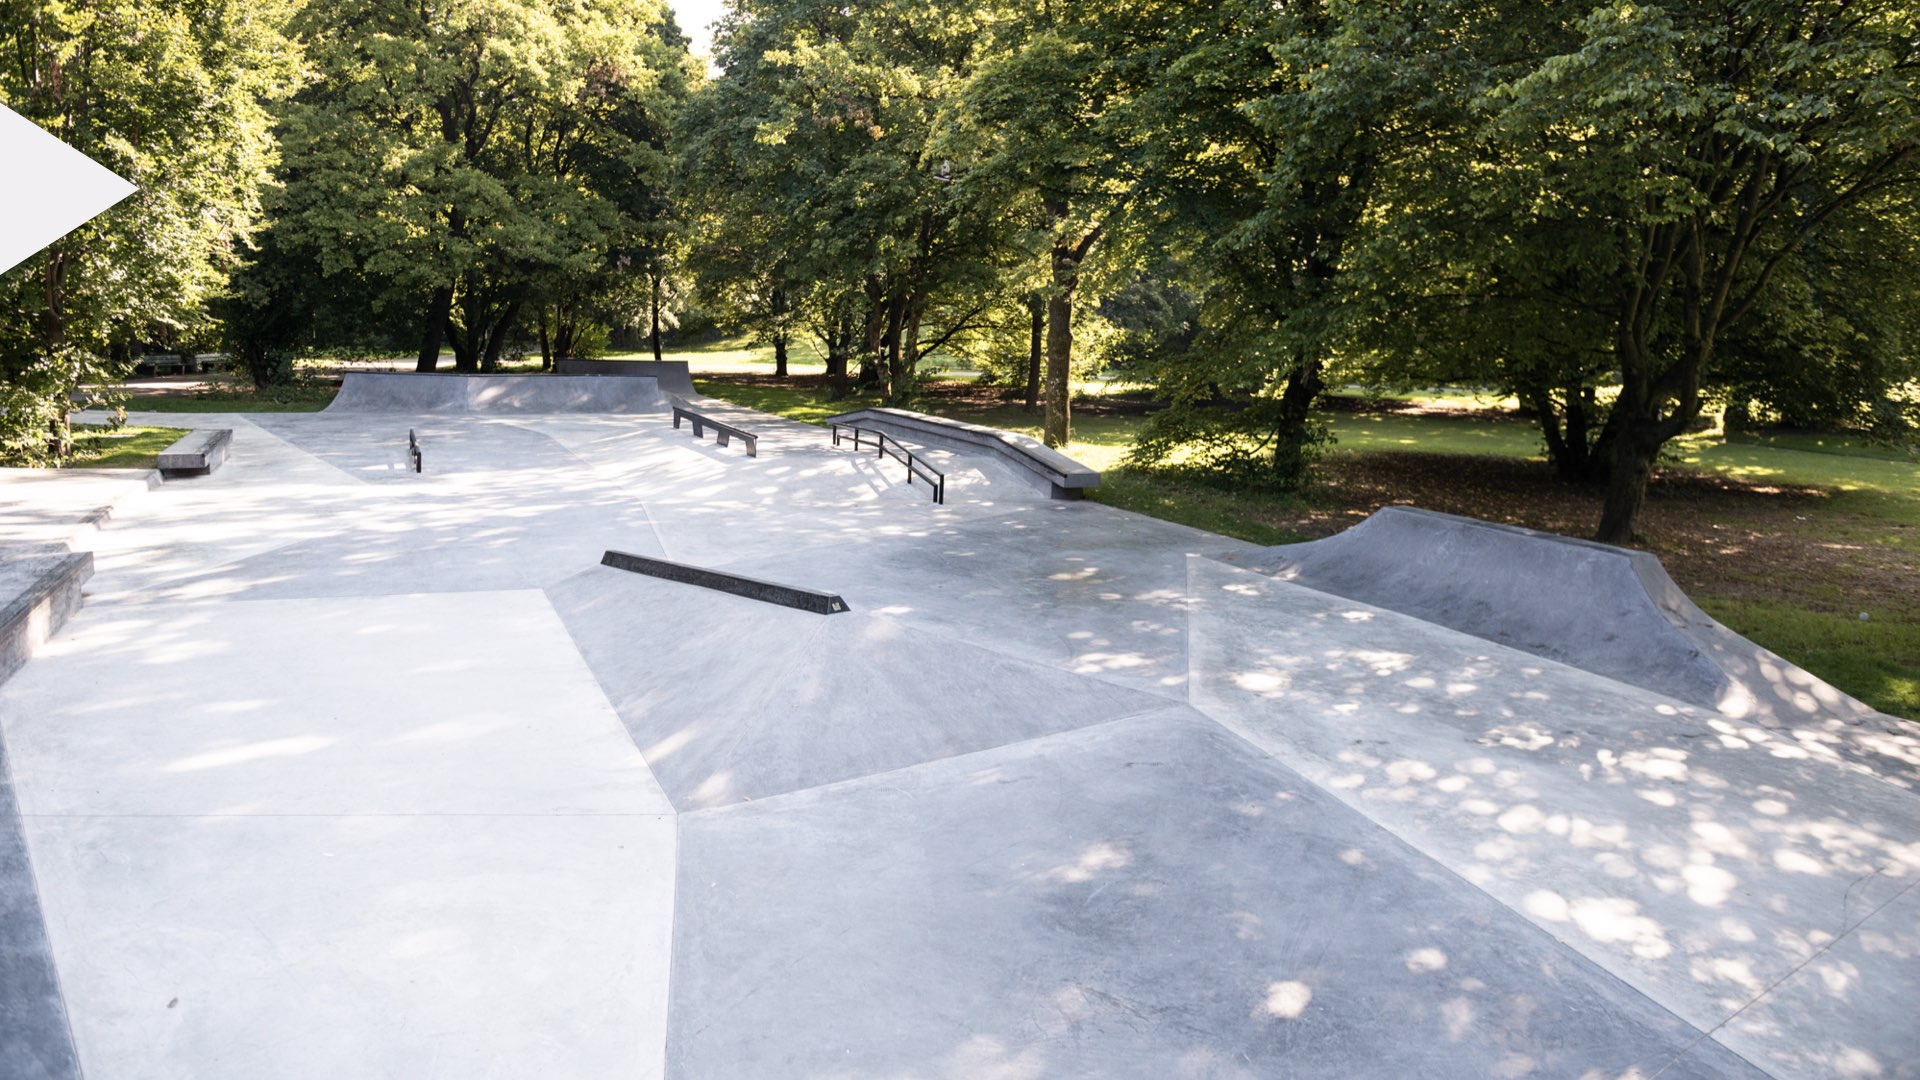 lndskt_skatepark_planung_hirschgarten_muenchen_landing